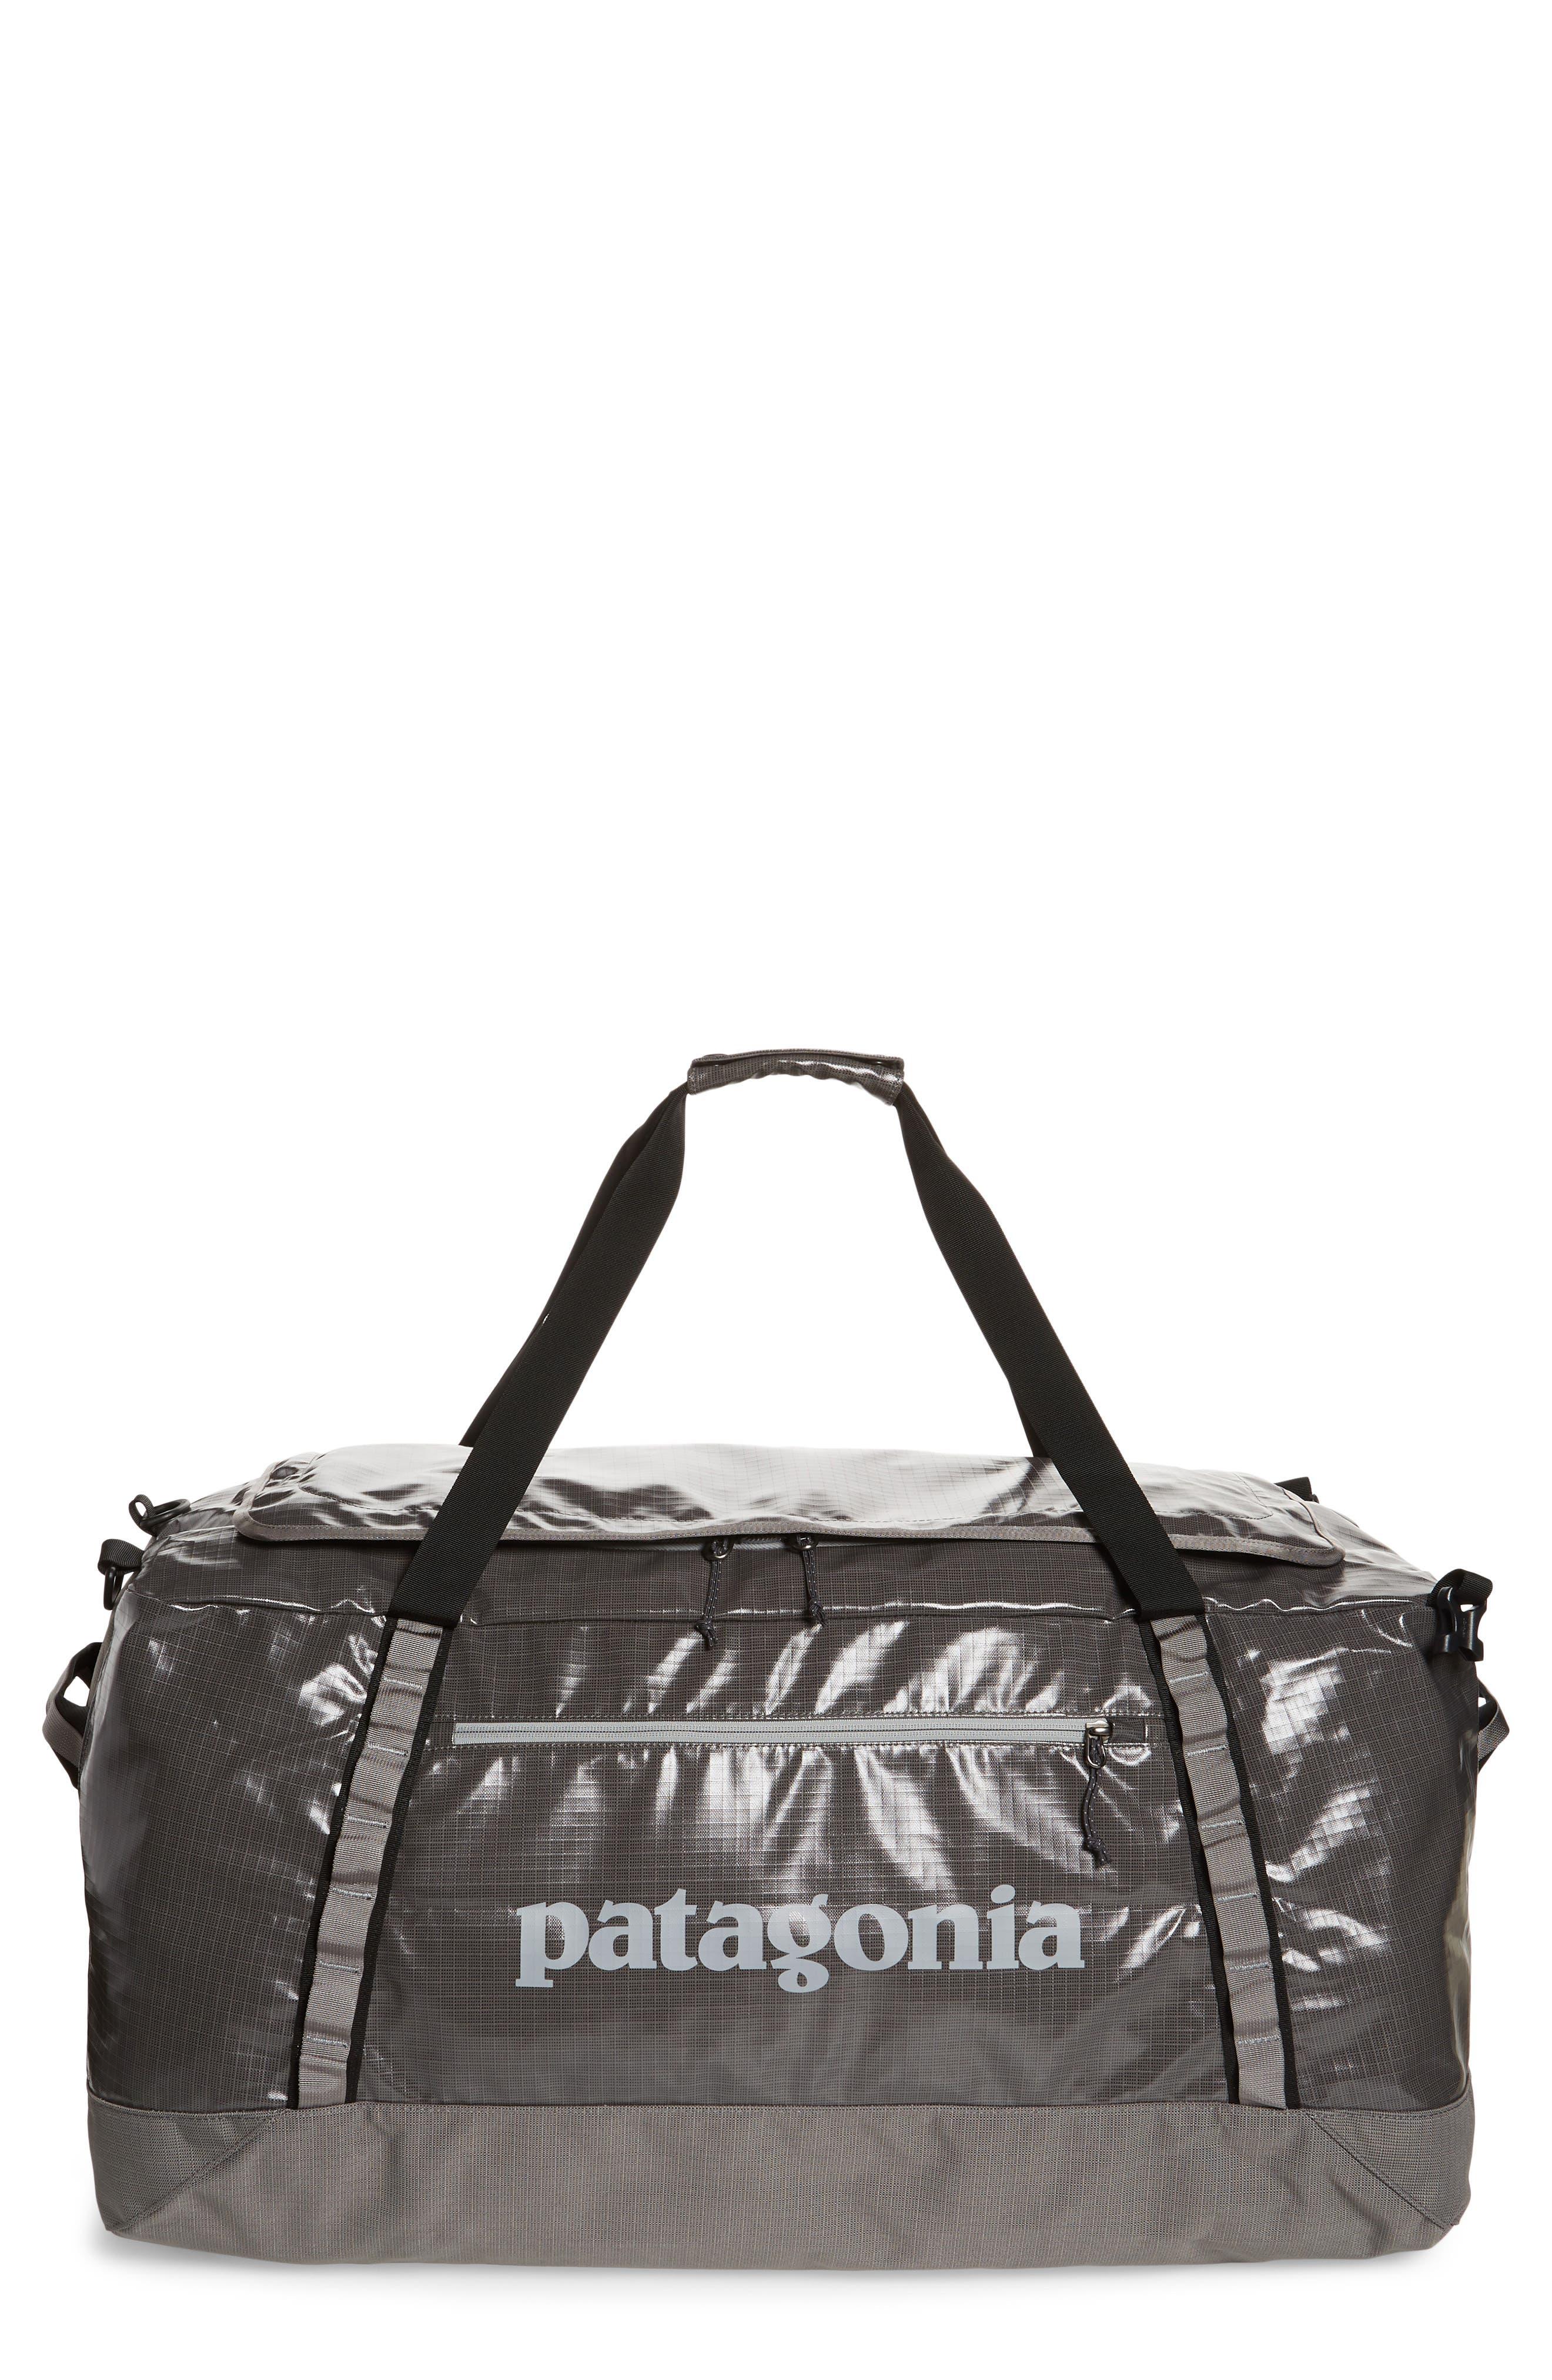 PATAGONIA Black Hole Duffel Bag - Grey in Hex Grey